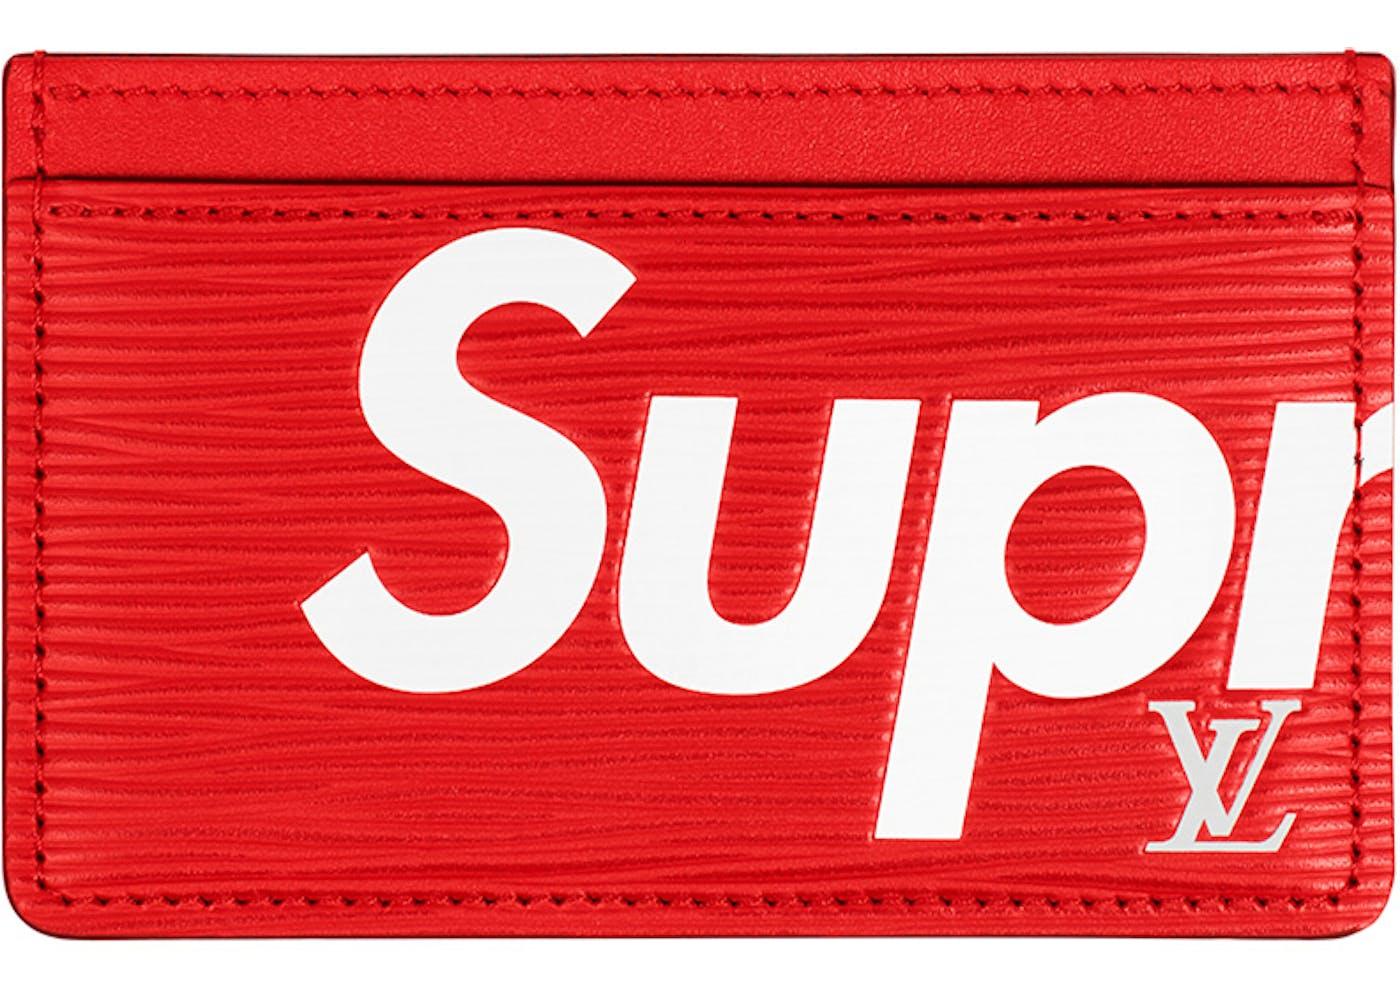 Louis vuitton x supreme porte carte simple epi red - Supreme louis vuitton porta carte ...